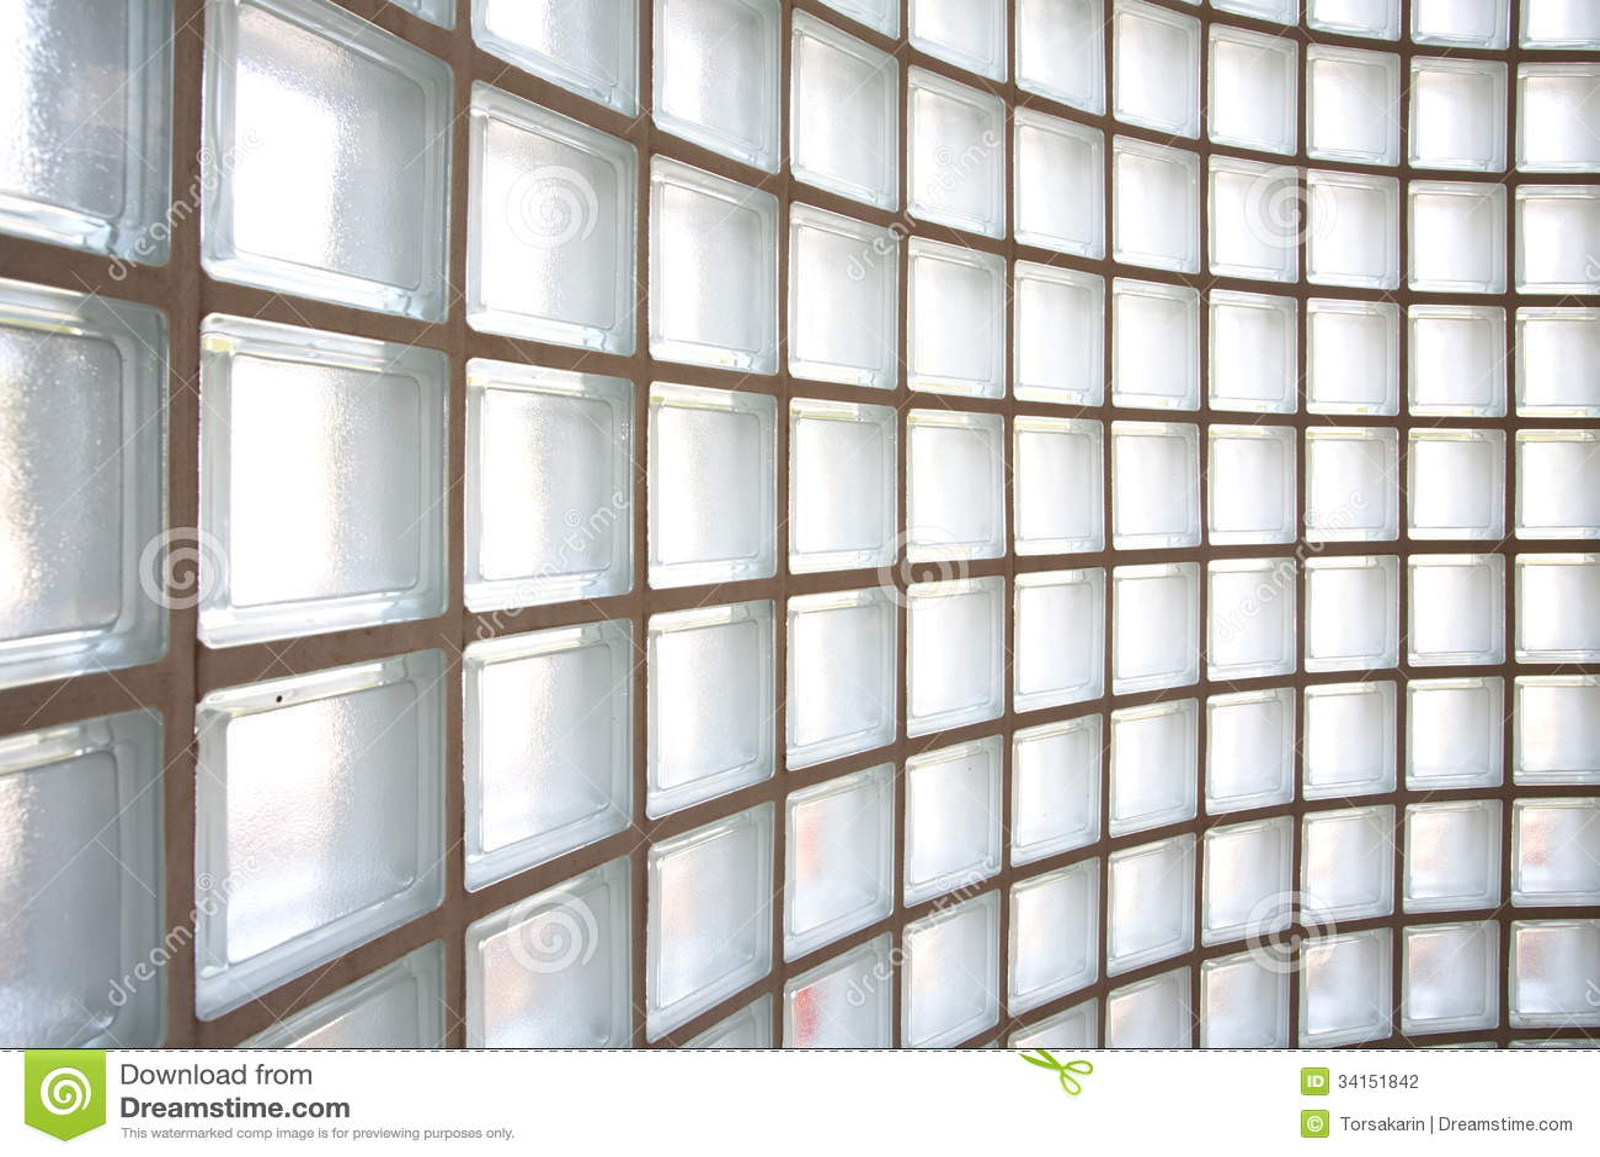 Glazed Block Wall : Glass block wall background stock photo image